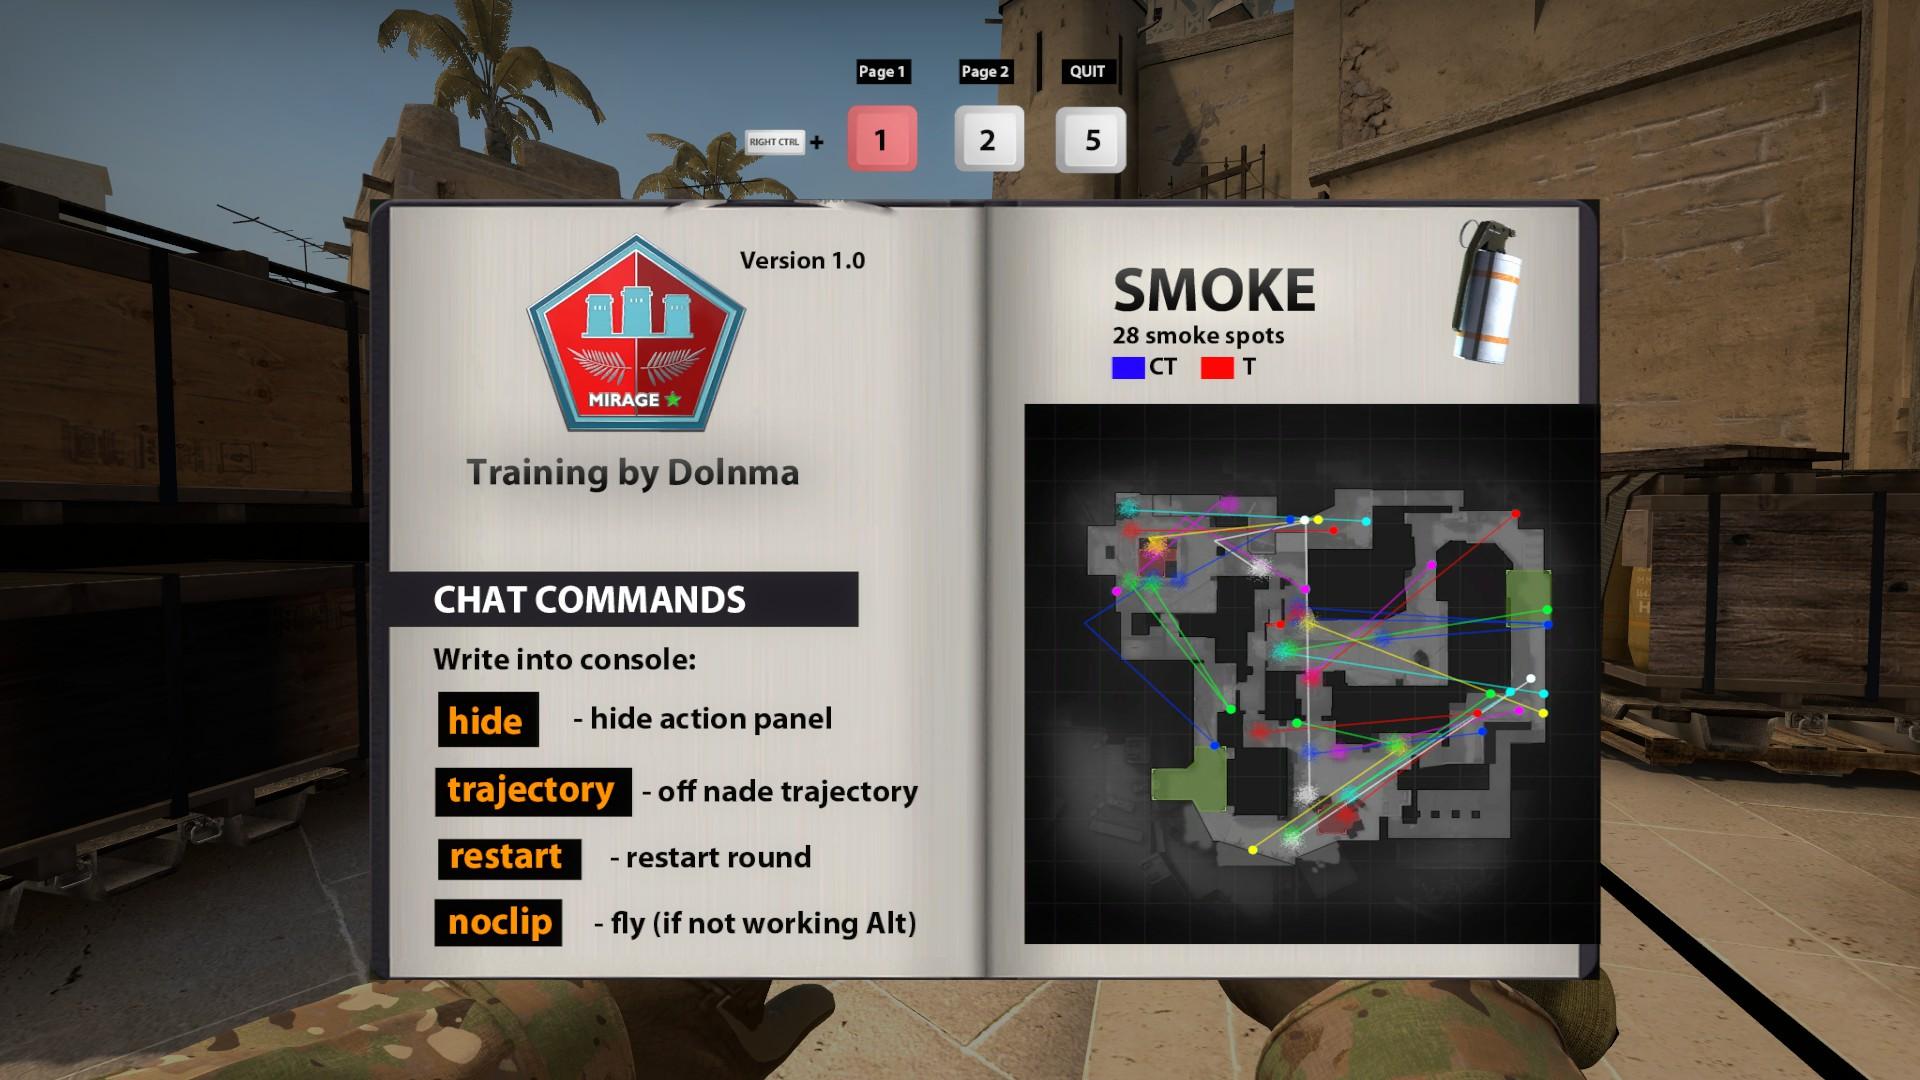 Steam Workshop :: Mirage Training by Dolnma